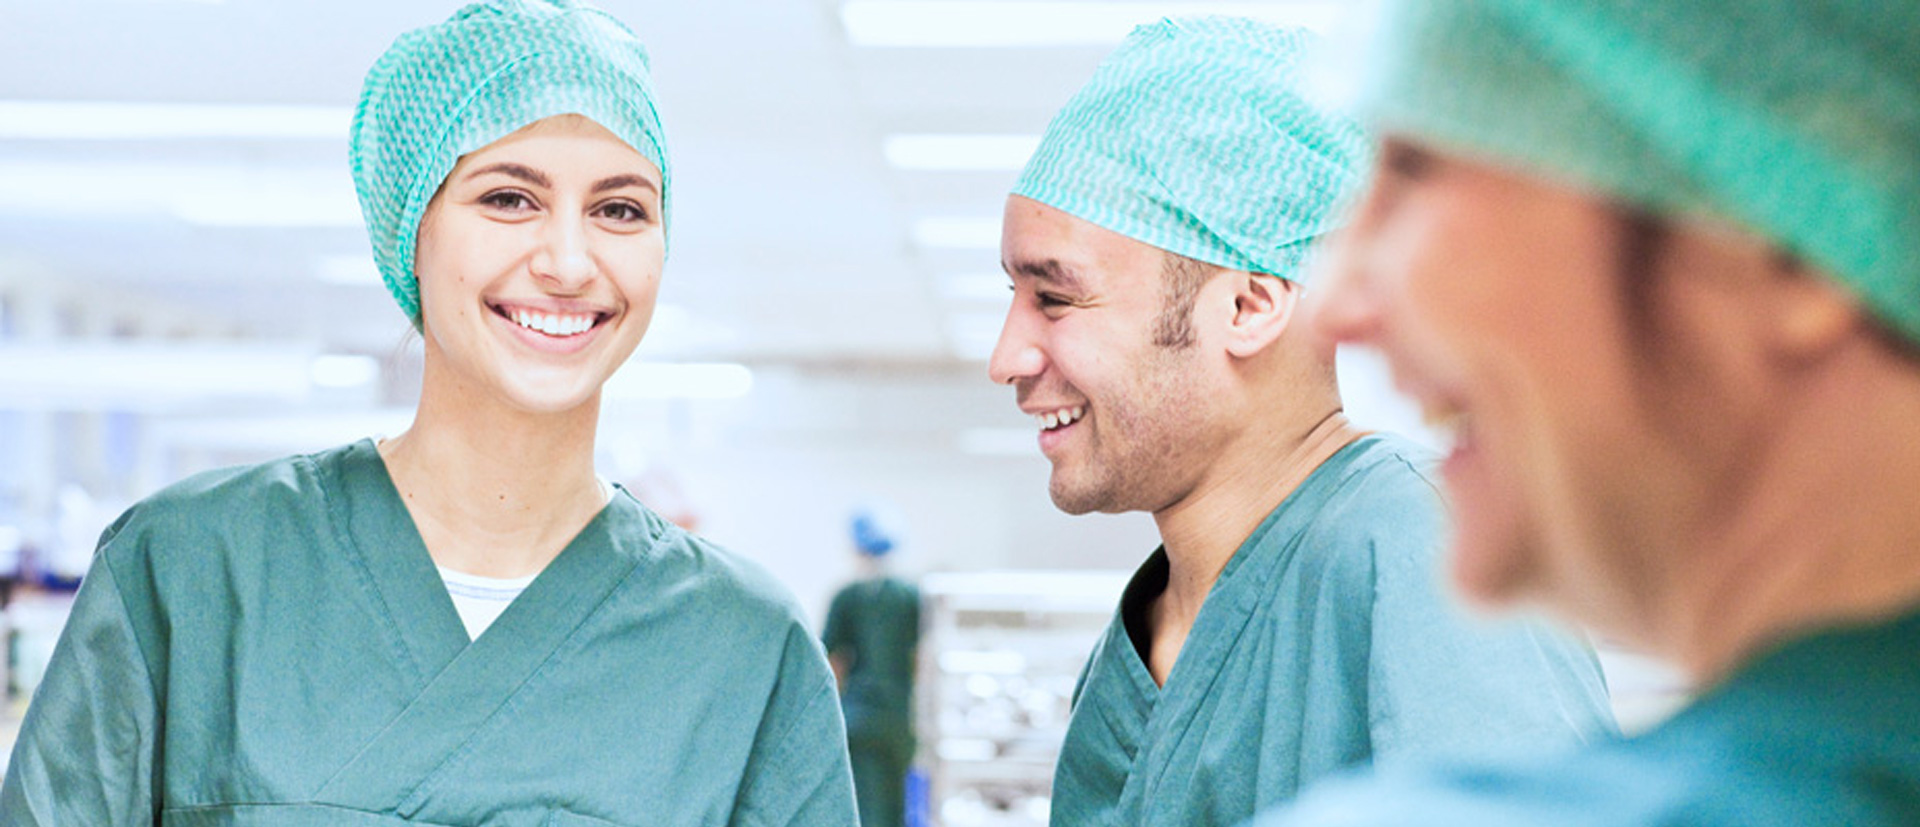 Three doctors/nurses in operation